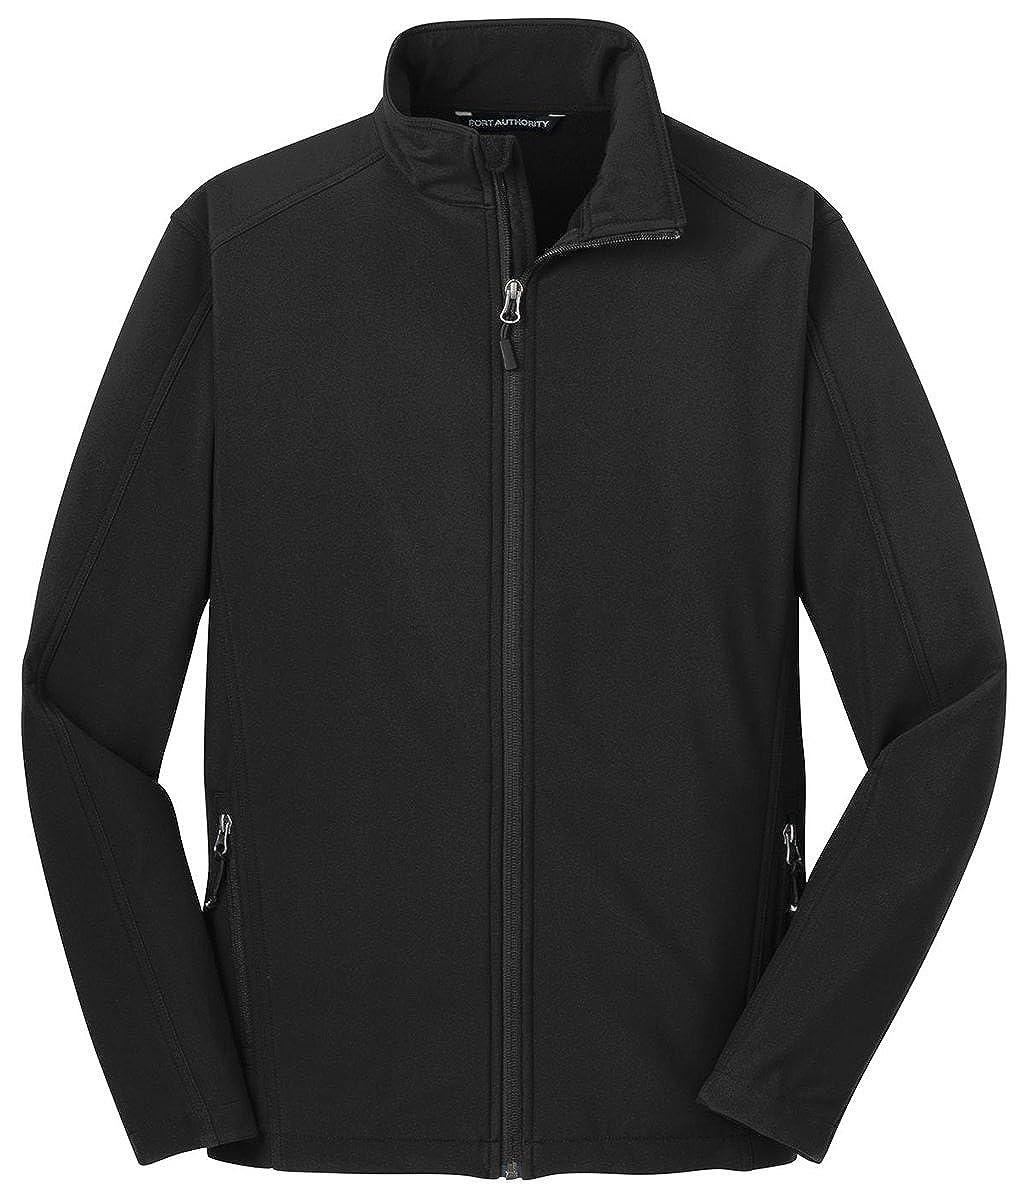 Port Authority Tall Core Soft Shell Jacket3XLT Black TLJ317